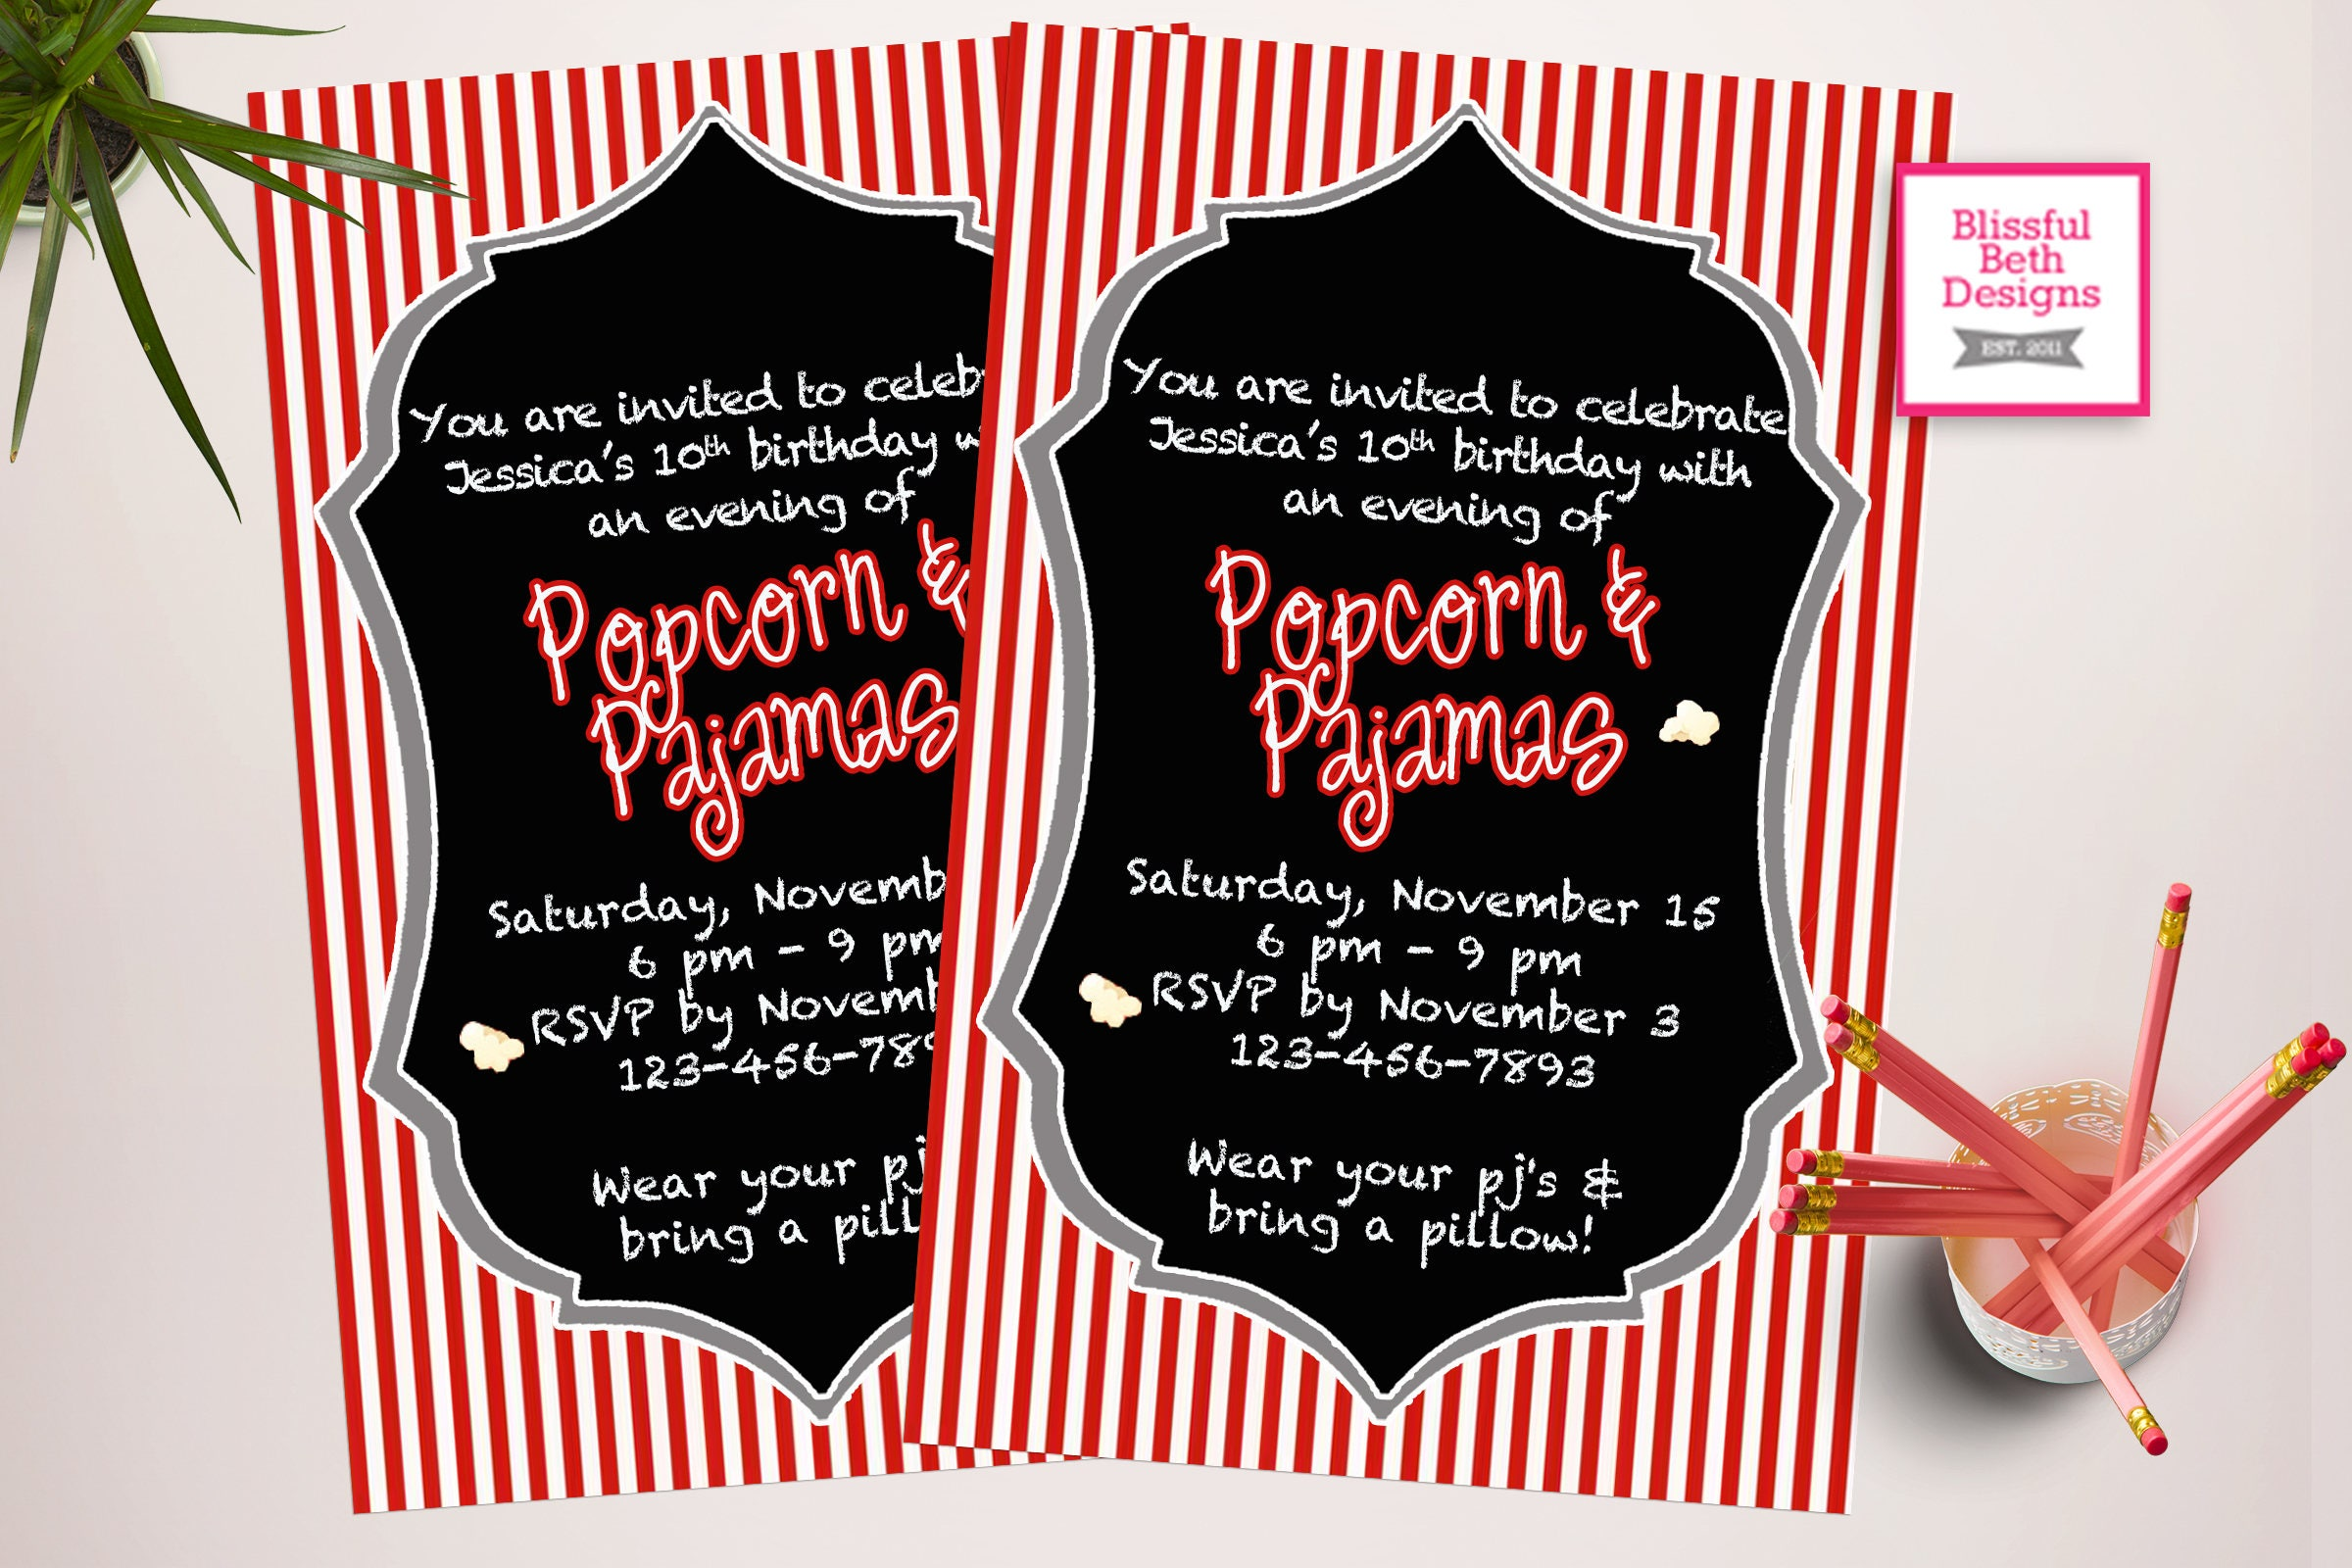 POPCORN PAJAMA INVITATION Popcorn and Pajamas, Sleep Over Invite ...